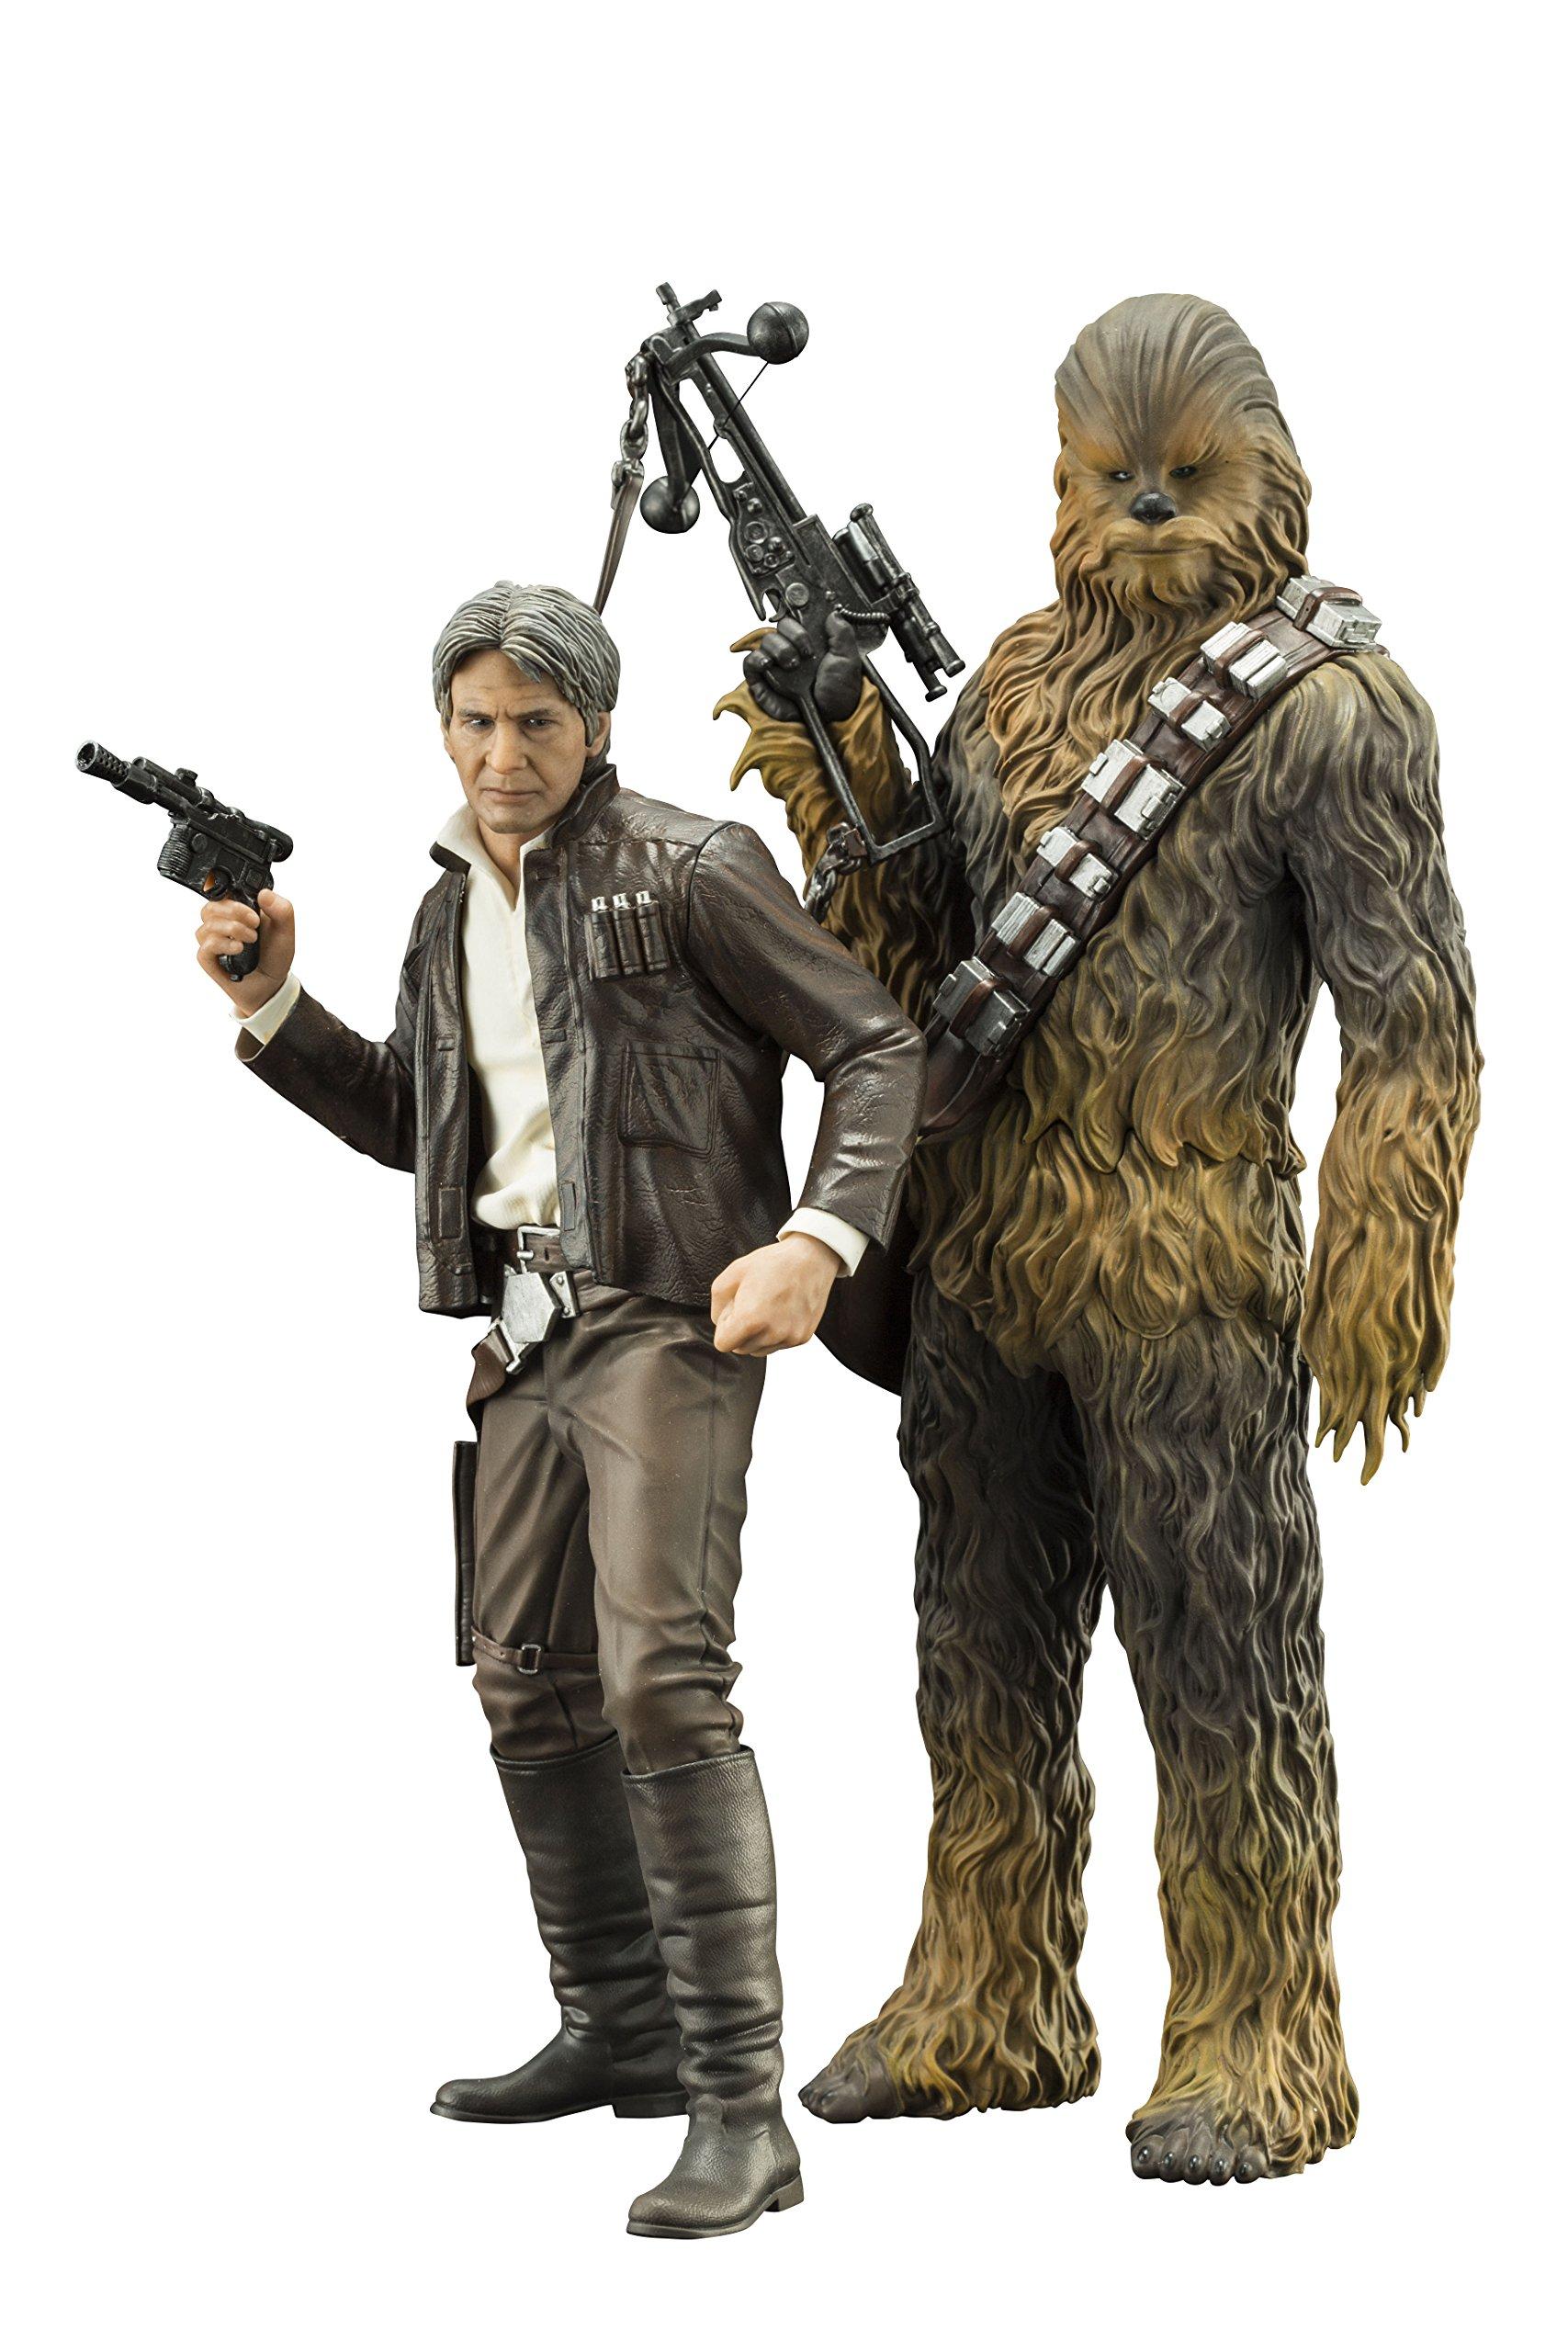 Kotobukiya Star Wars: The Force Awakens: Han Solo & Chewbacca ArtFX+ Statue (2 Pack)